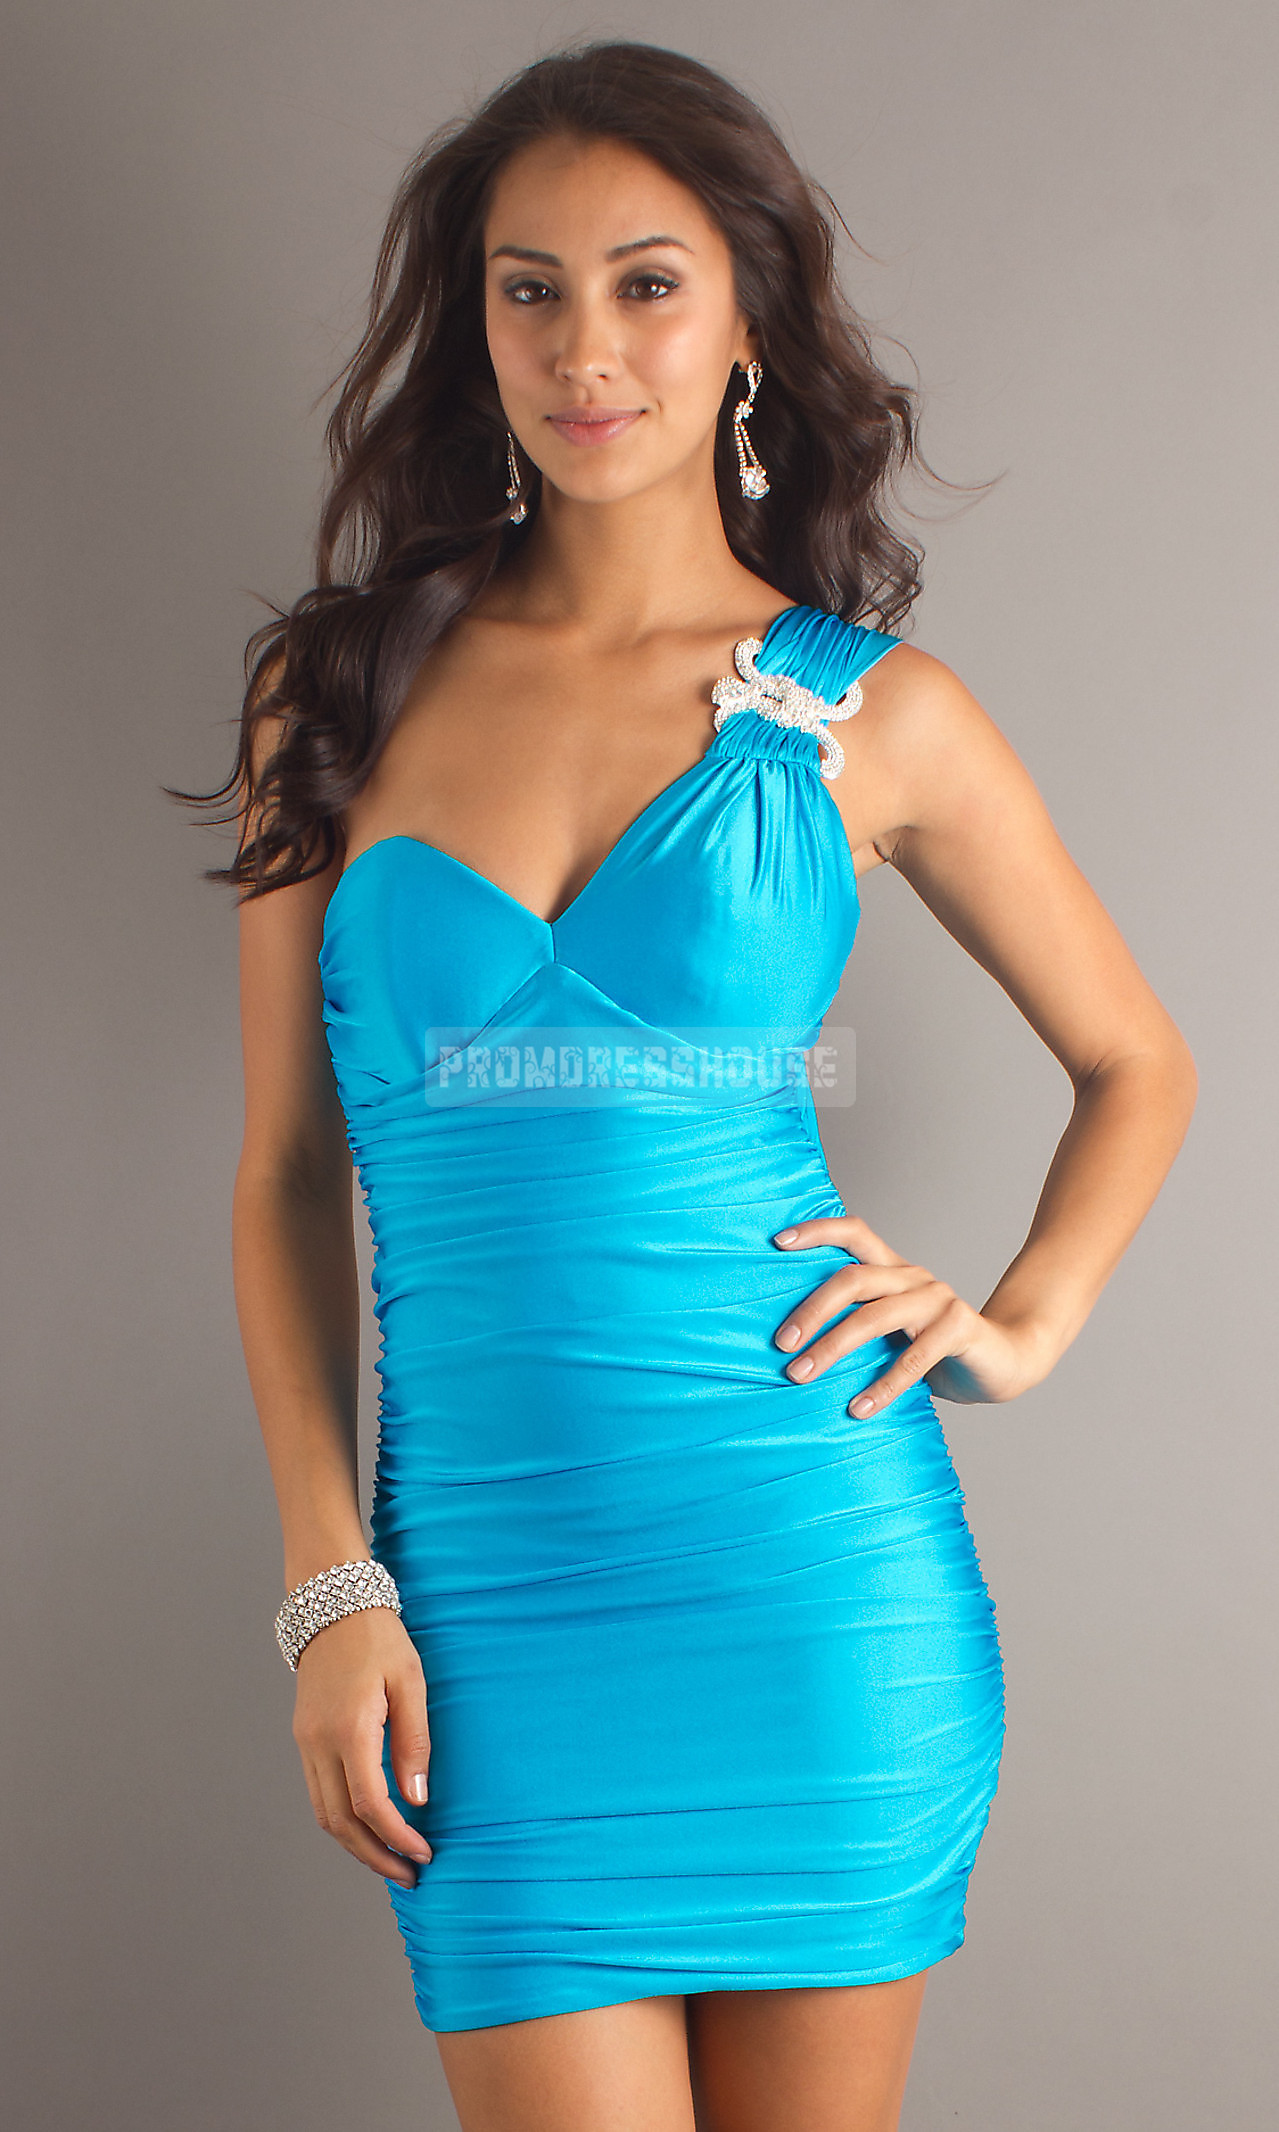 Sheath Elastic Sleeveless Short Length -like Keyhole Back Brooch Prom Dress - Promdresshouse.com